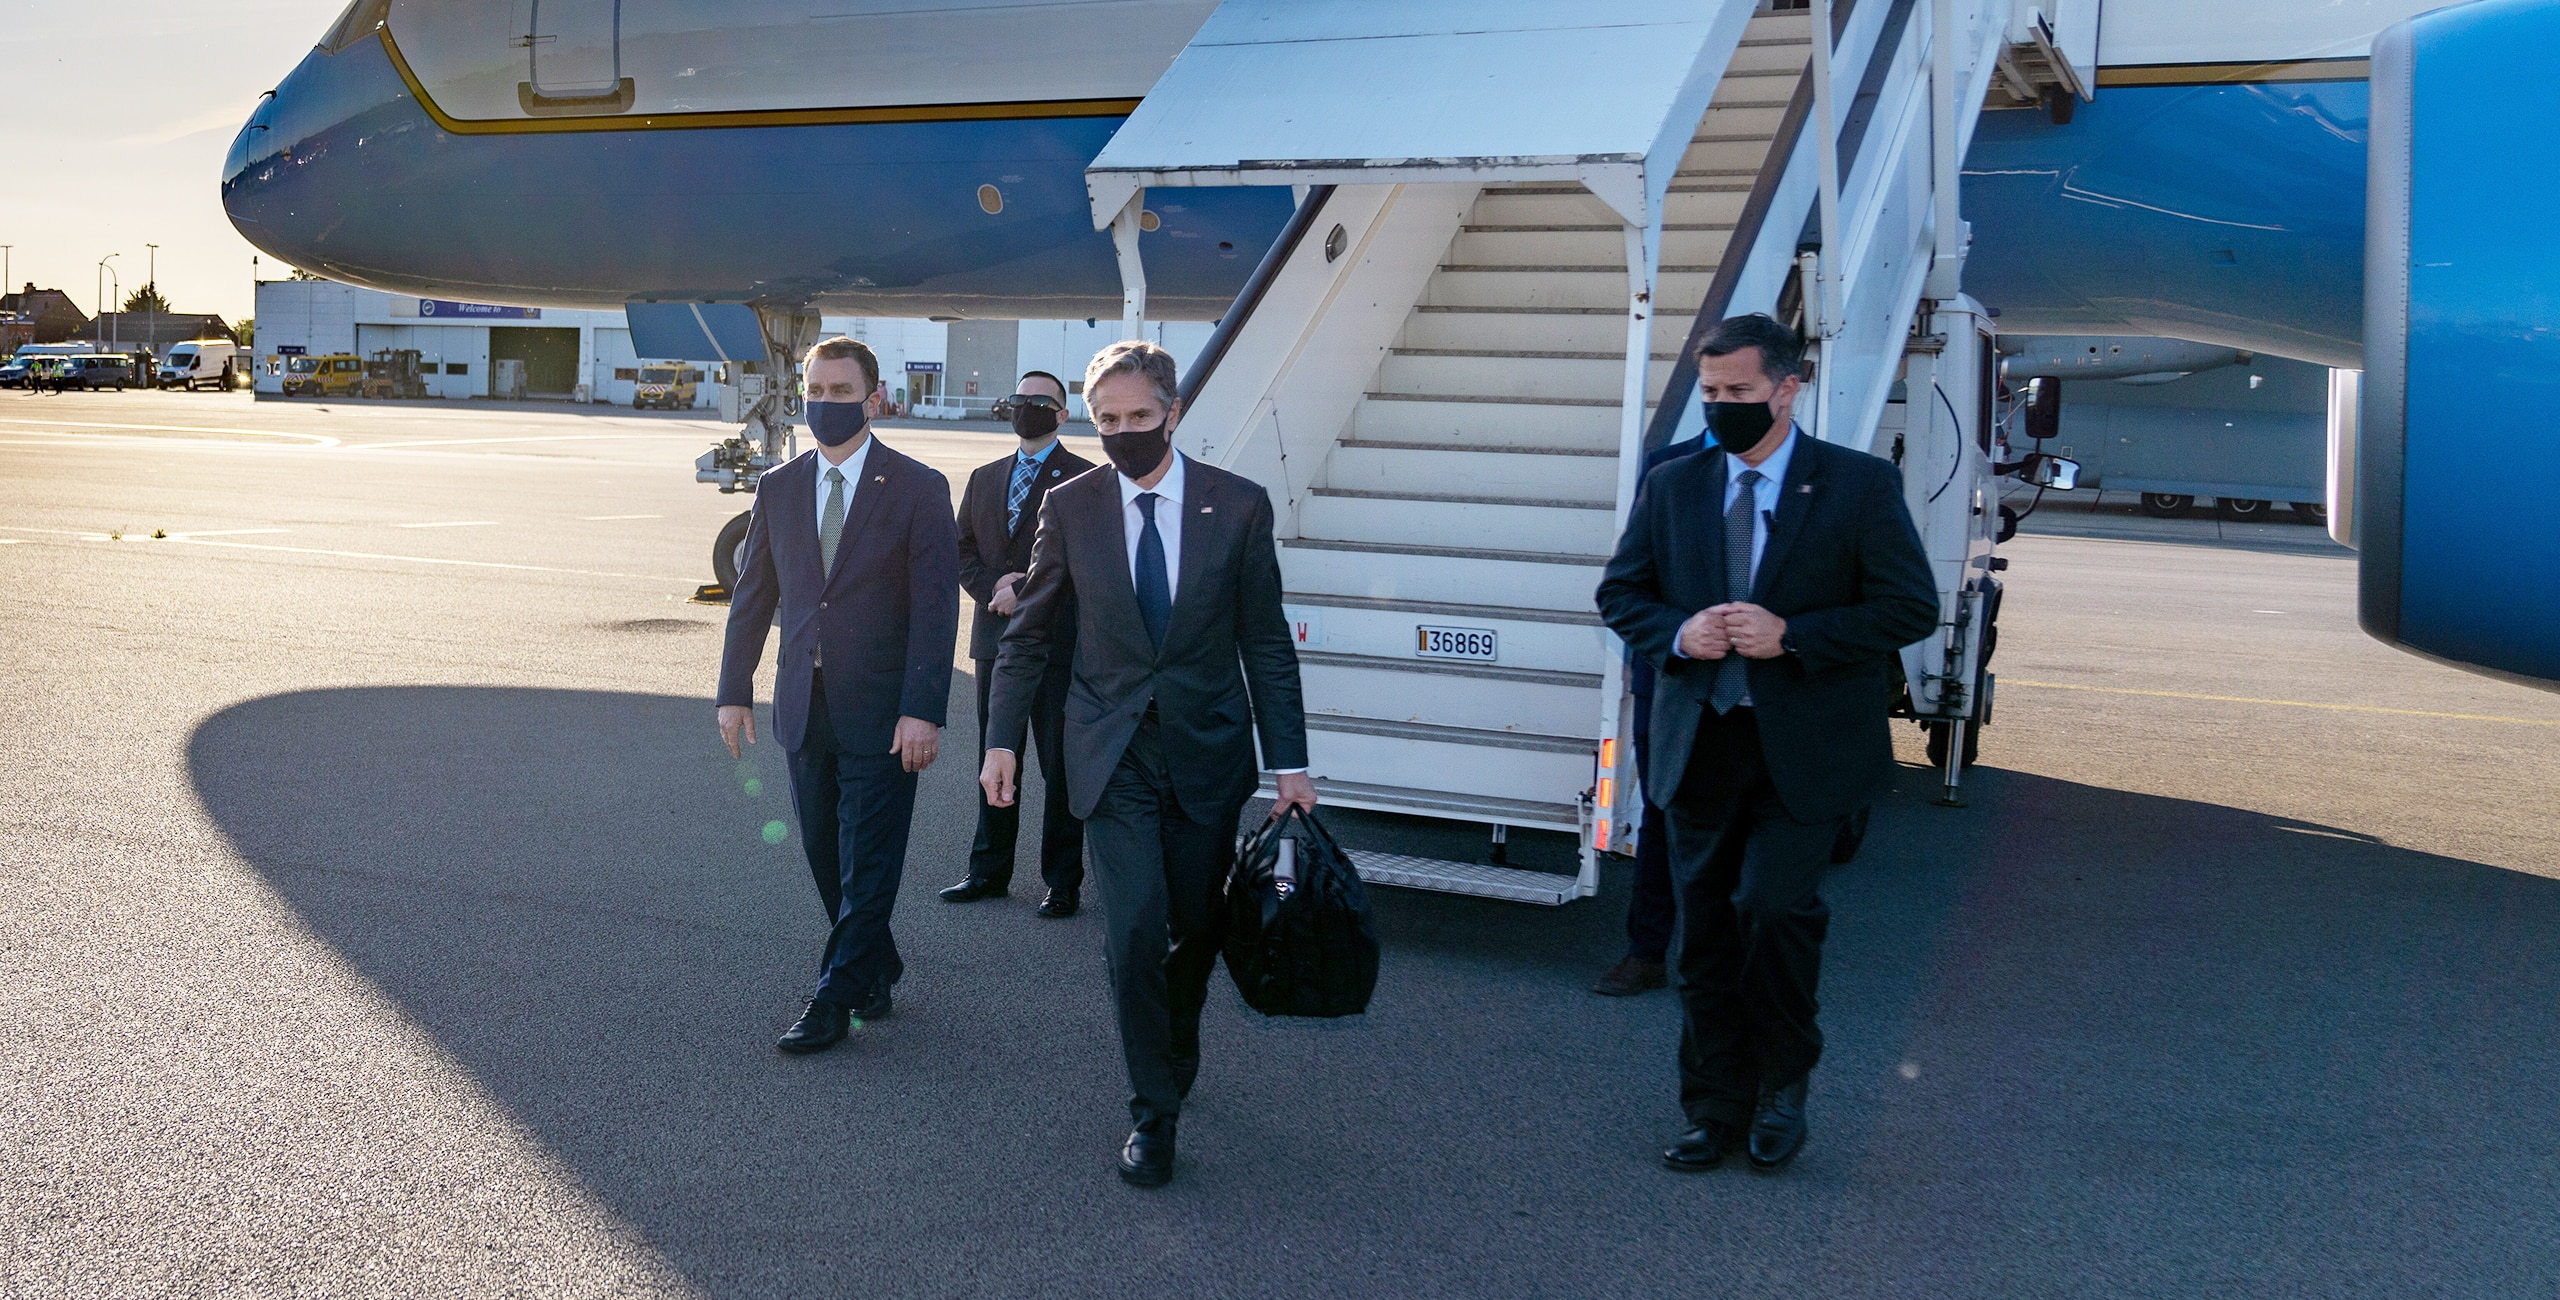 Secretary of State Antony J. Blinken arrives in Brussels, Belgium, on June 12, 2021. [State Department photo by Ron Przysucha/ Public Domain]